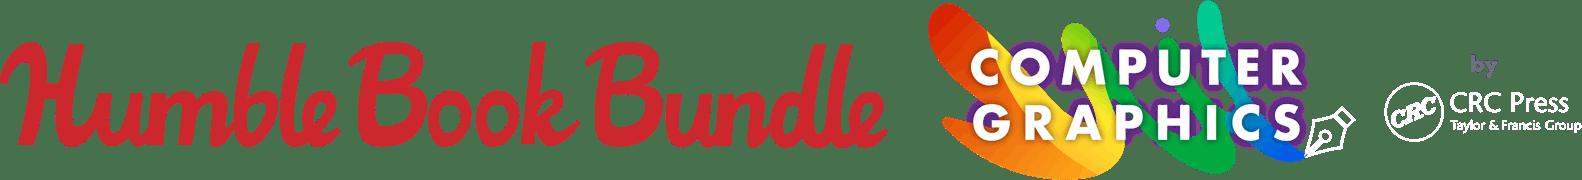 Humble Book Bundle: Computer Graphics by CRC Press